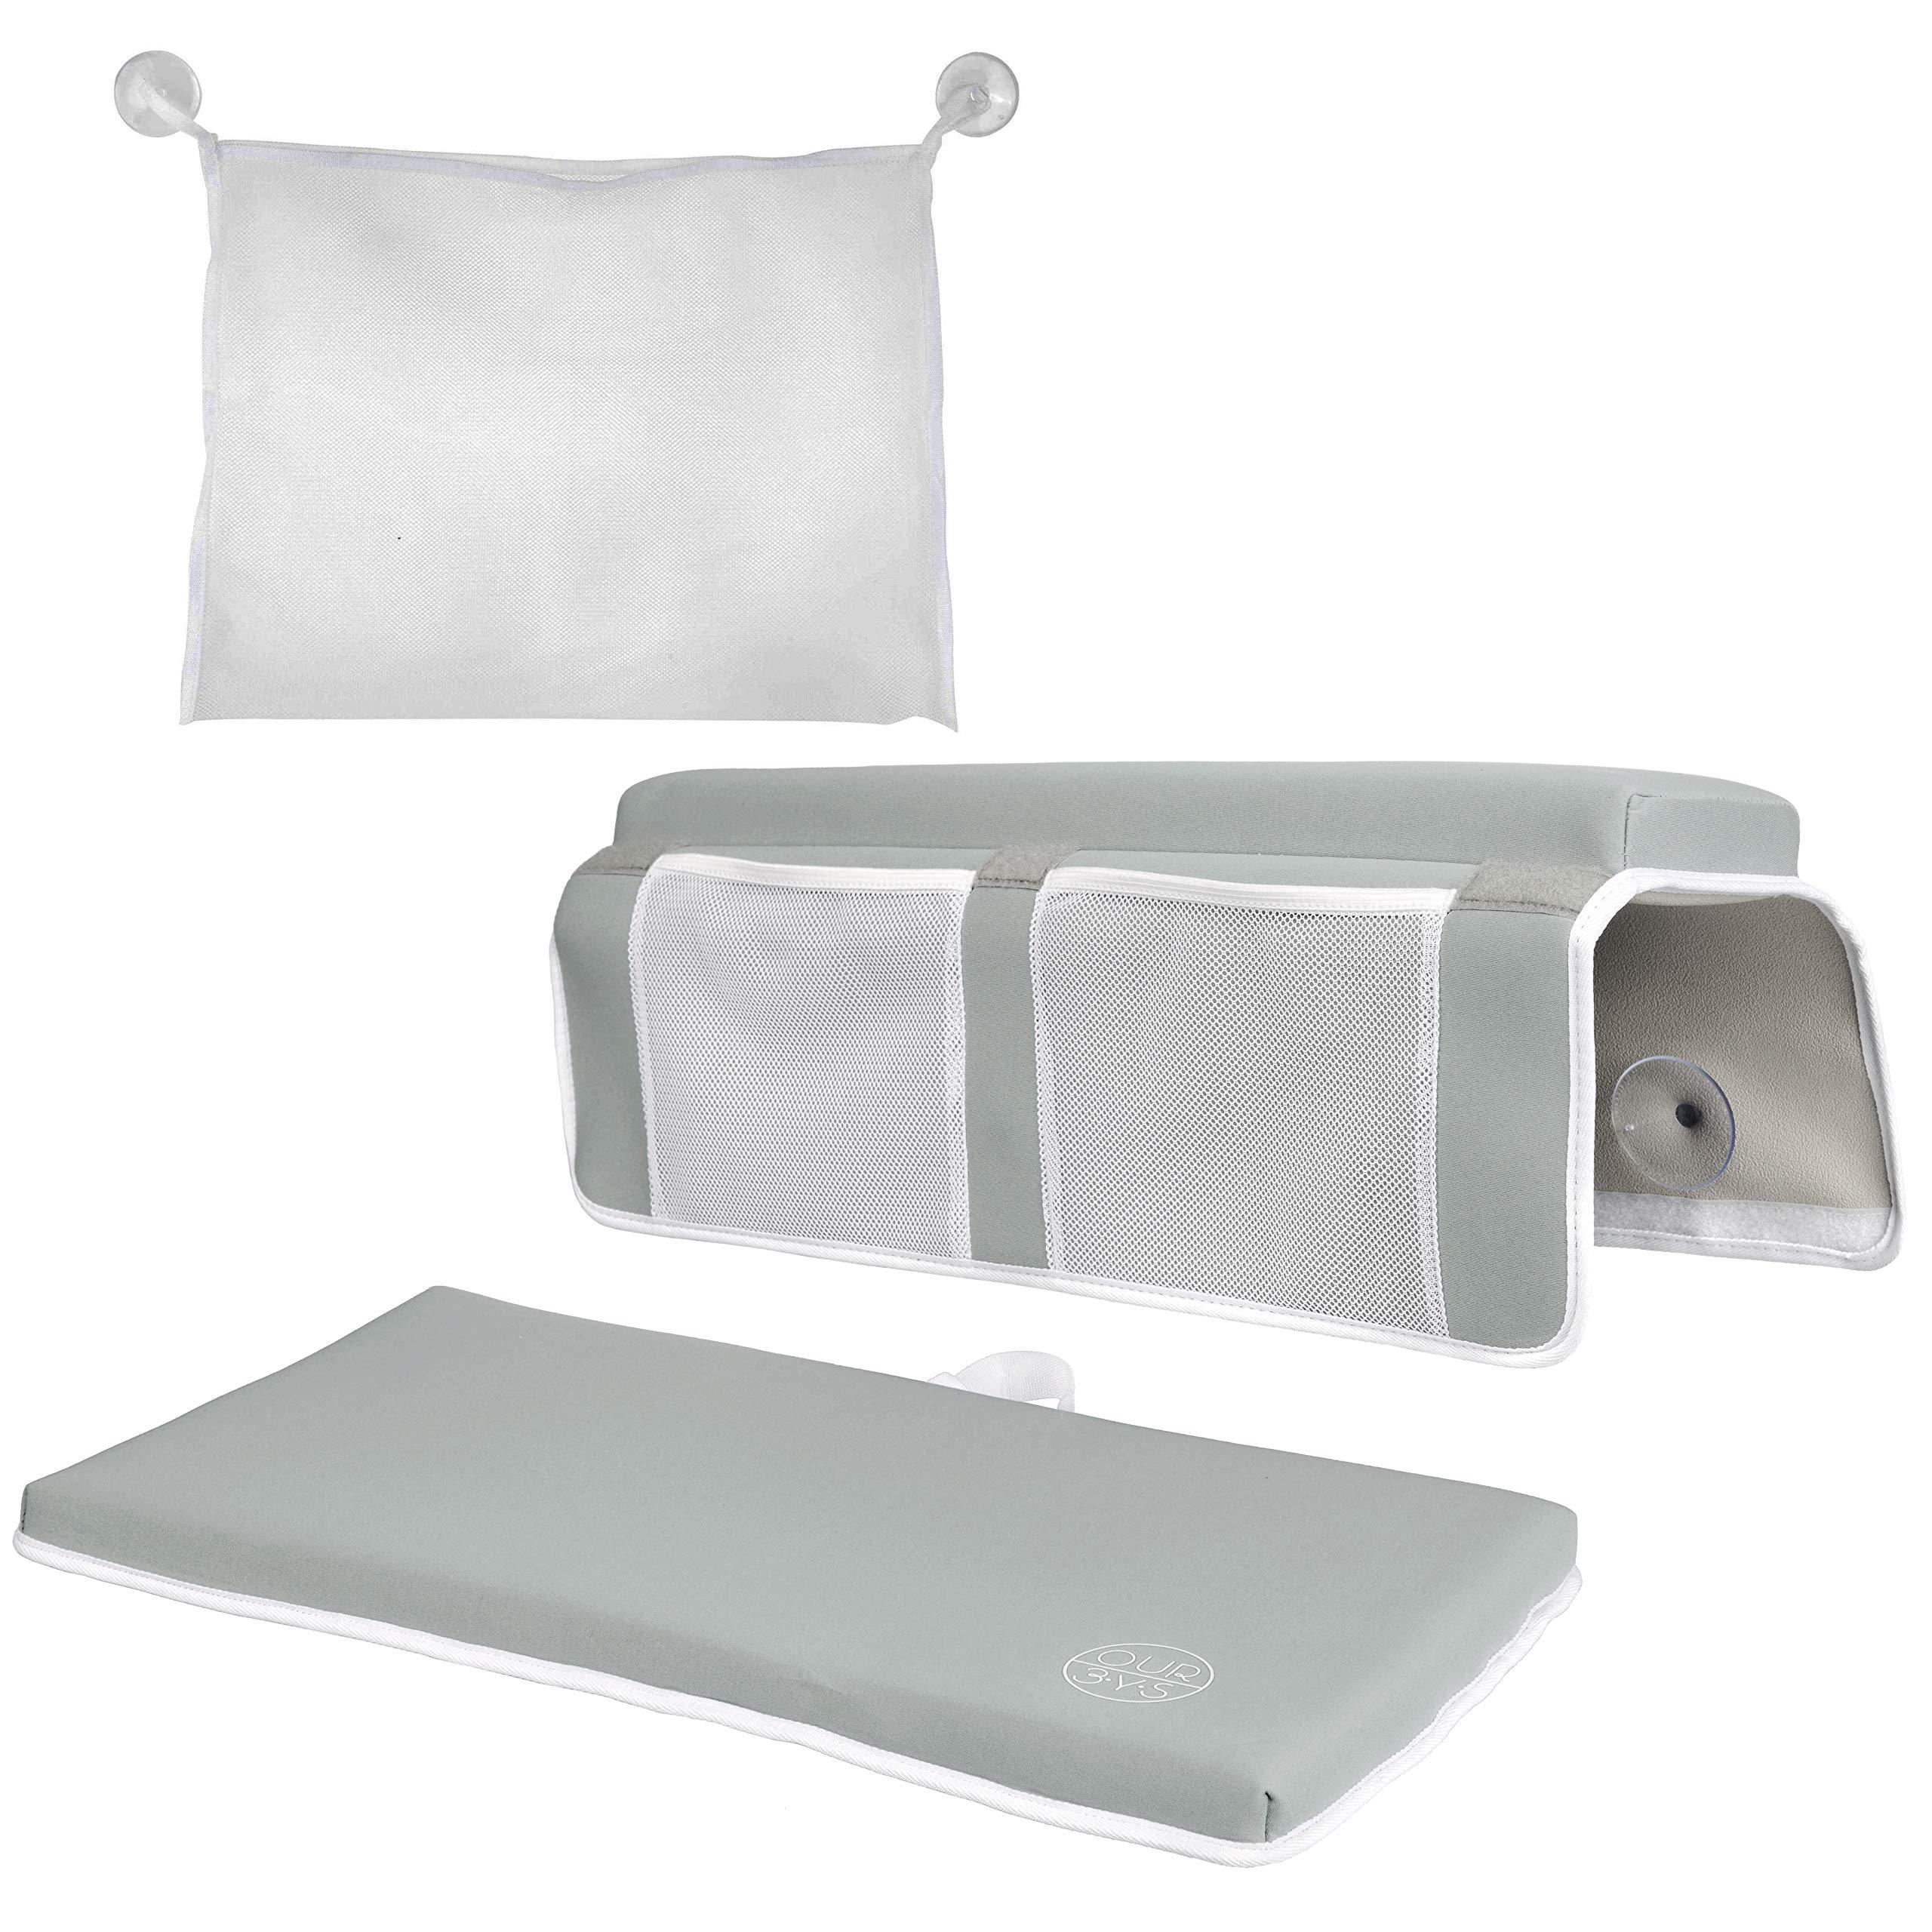 Elbow Rest & Kneeling Pad for Bathtub: Baby Bath Comfort Kneeler & Arm Cushion by OUR3YS